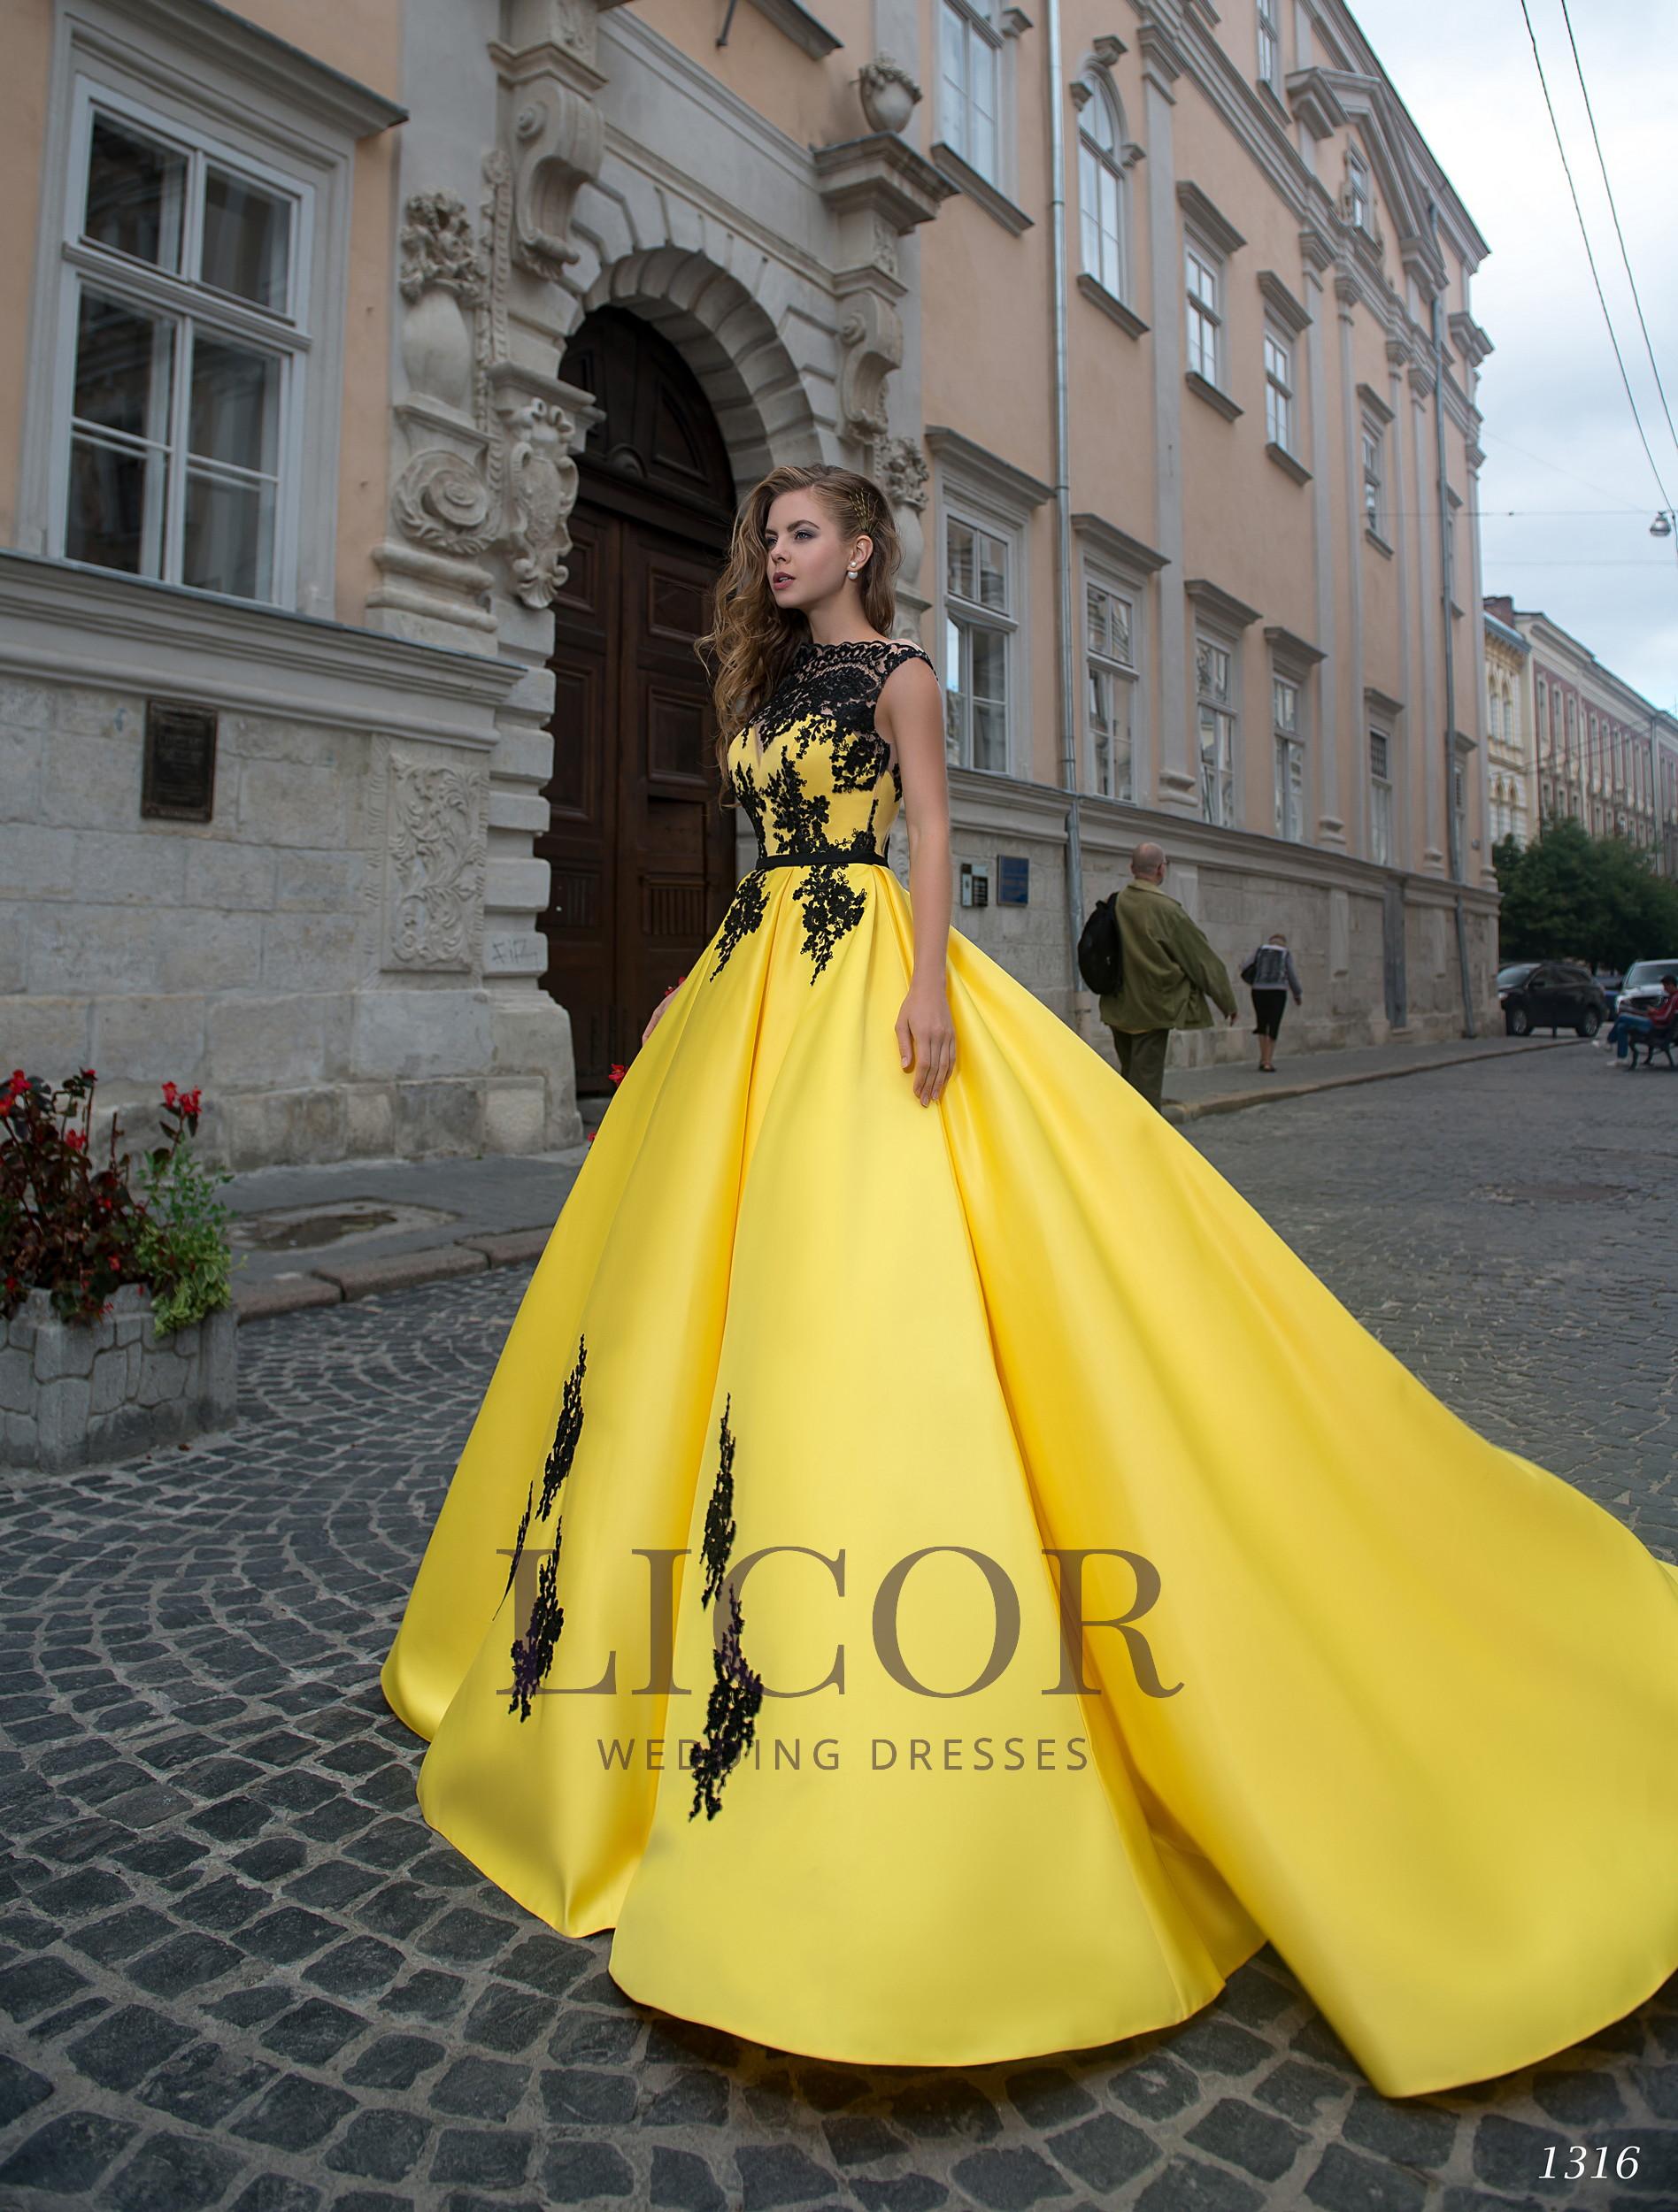 https://licor.com.ua/images/stories/virtuemart/product/1316(1).jpg